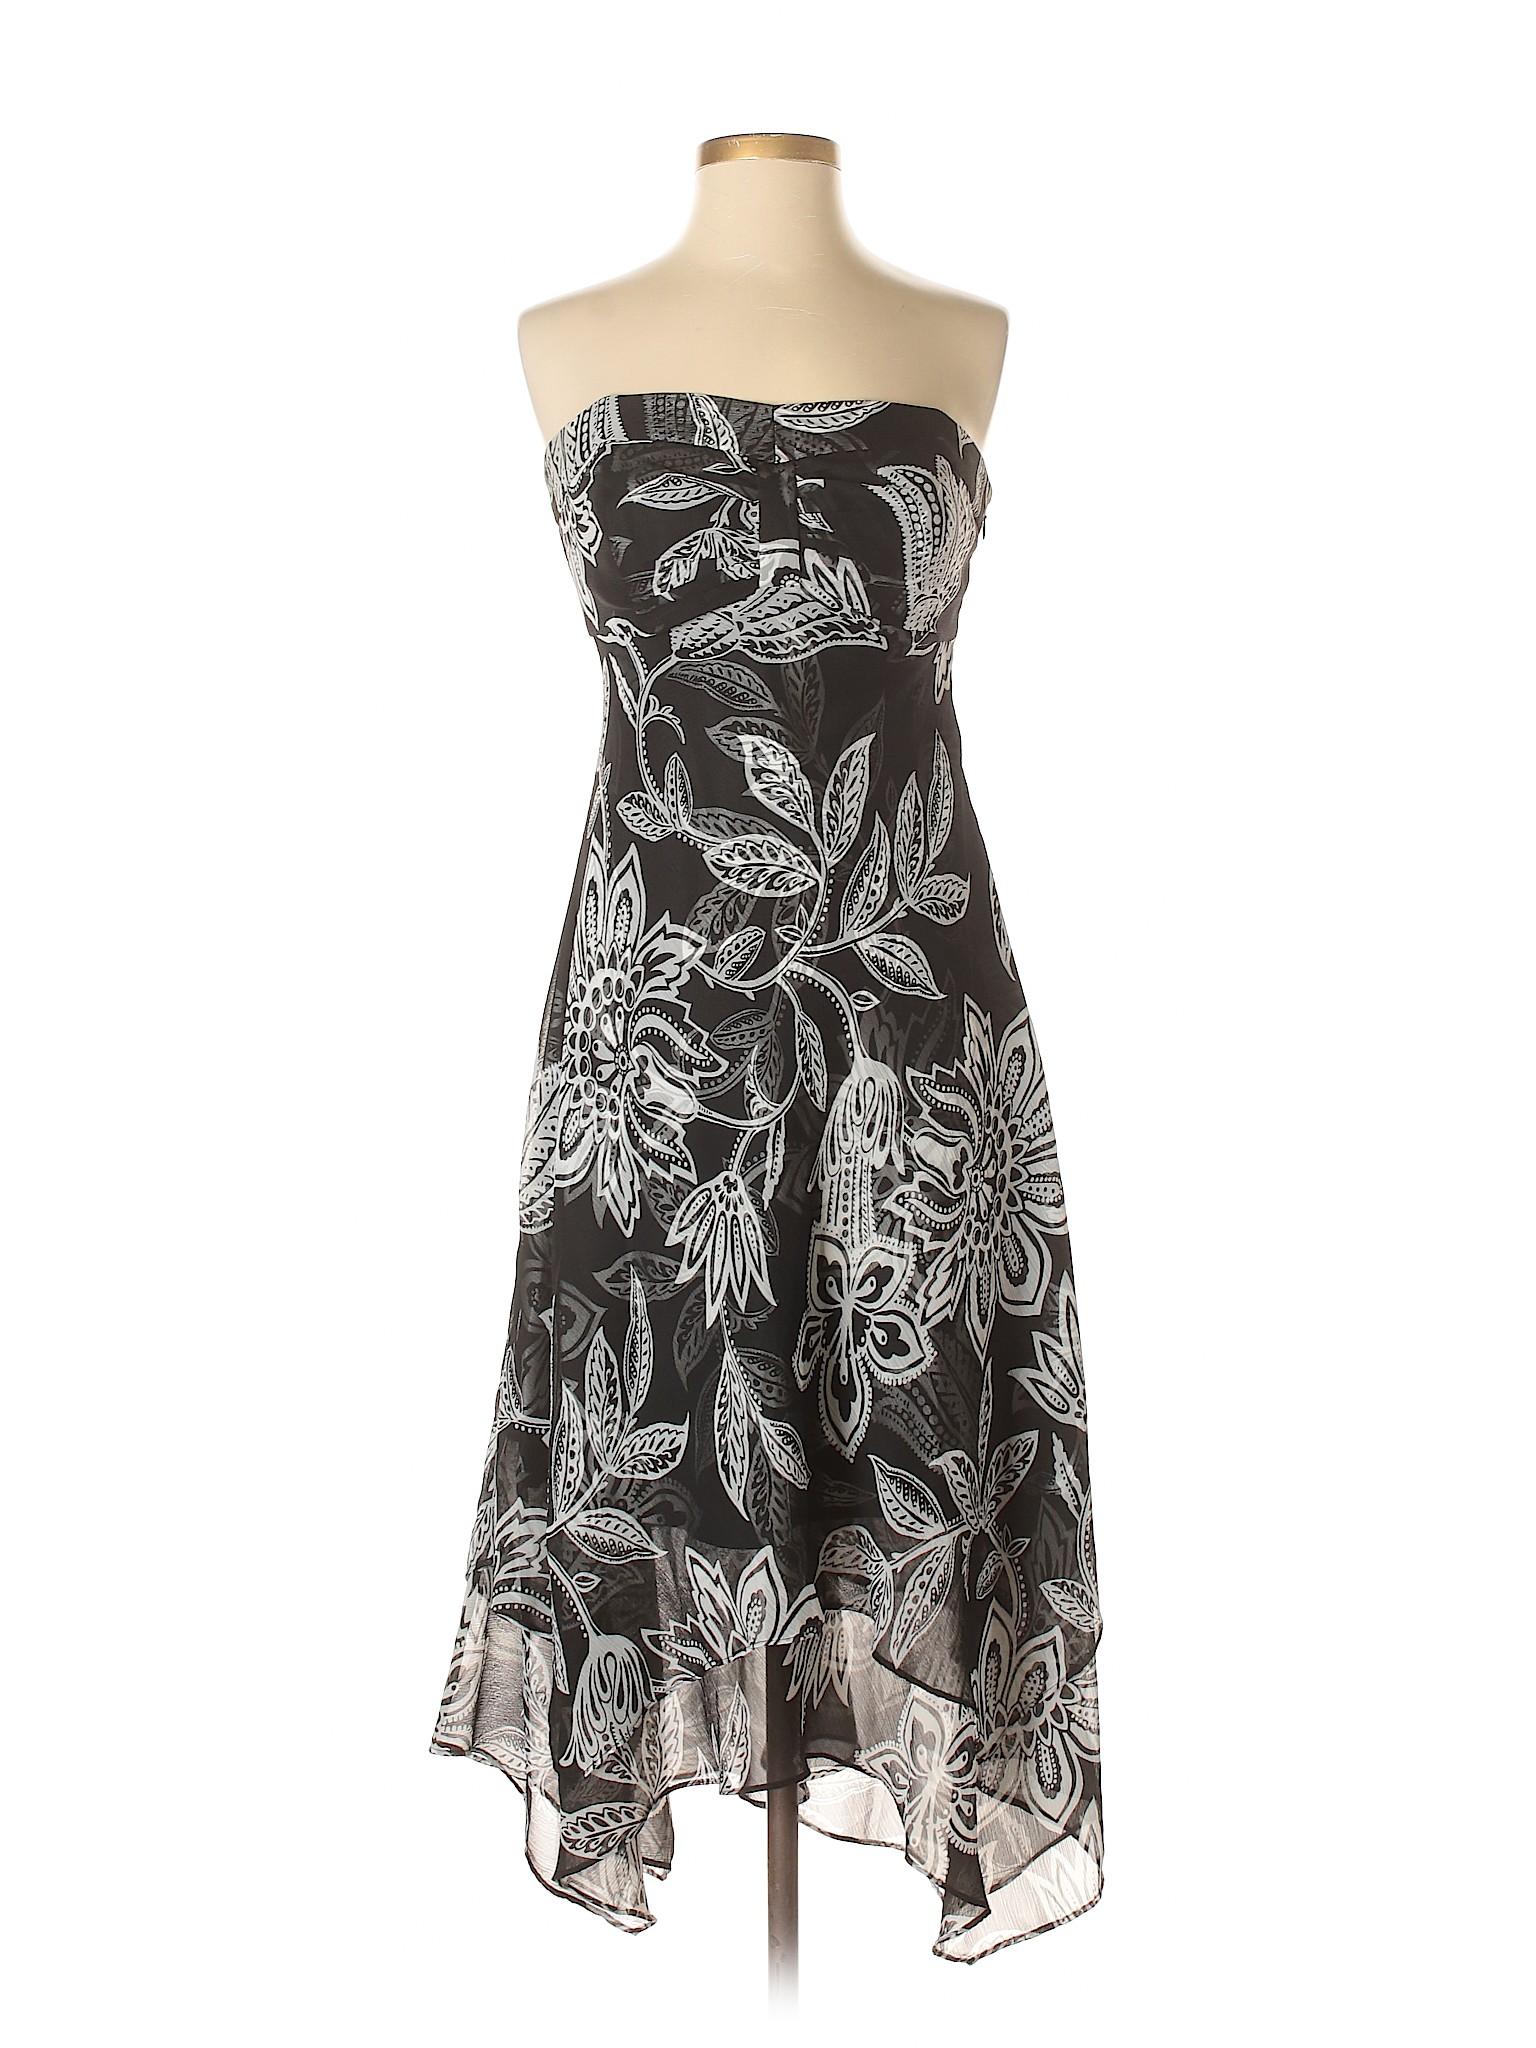 Casual White Dress Black winter Market Boutique House q1T5nX